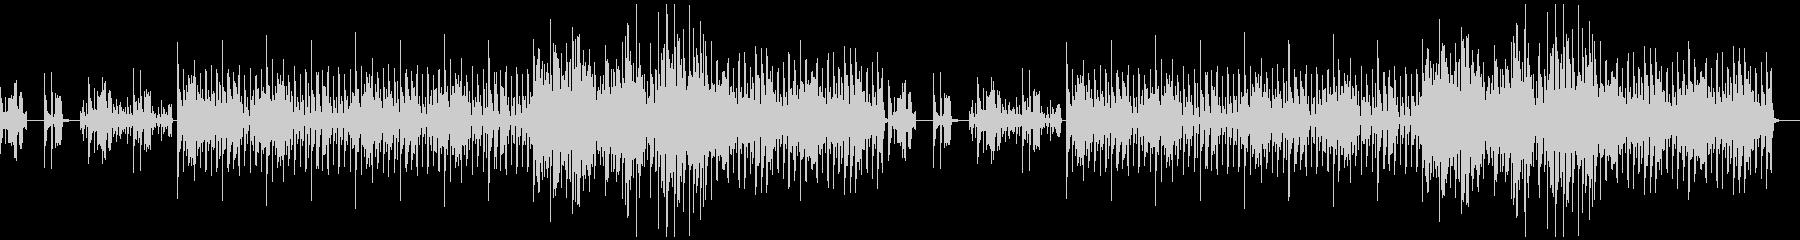 【Jazz】おしゃれなジャズハウス・1の未再生の波形